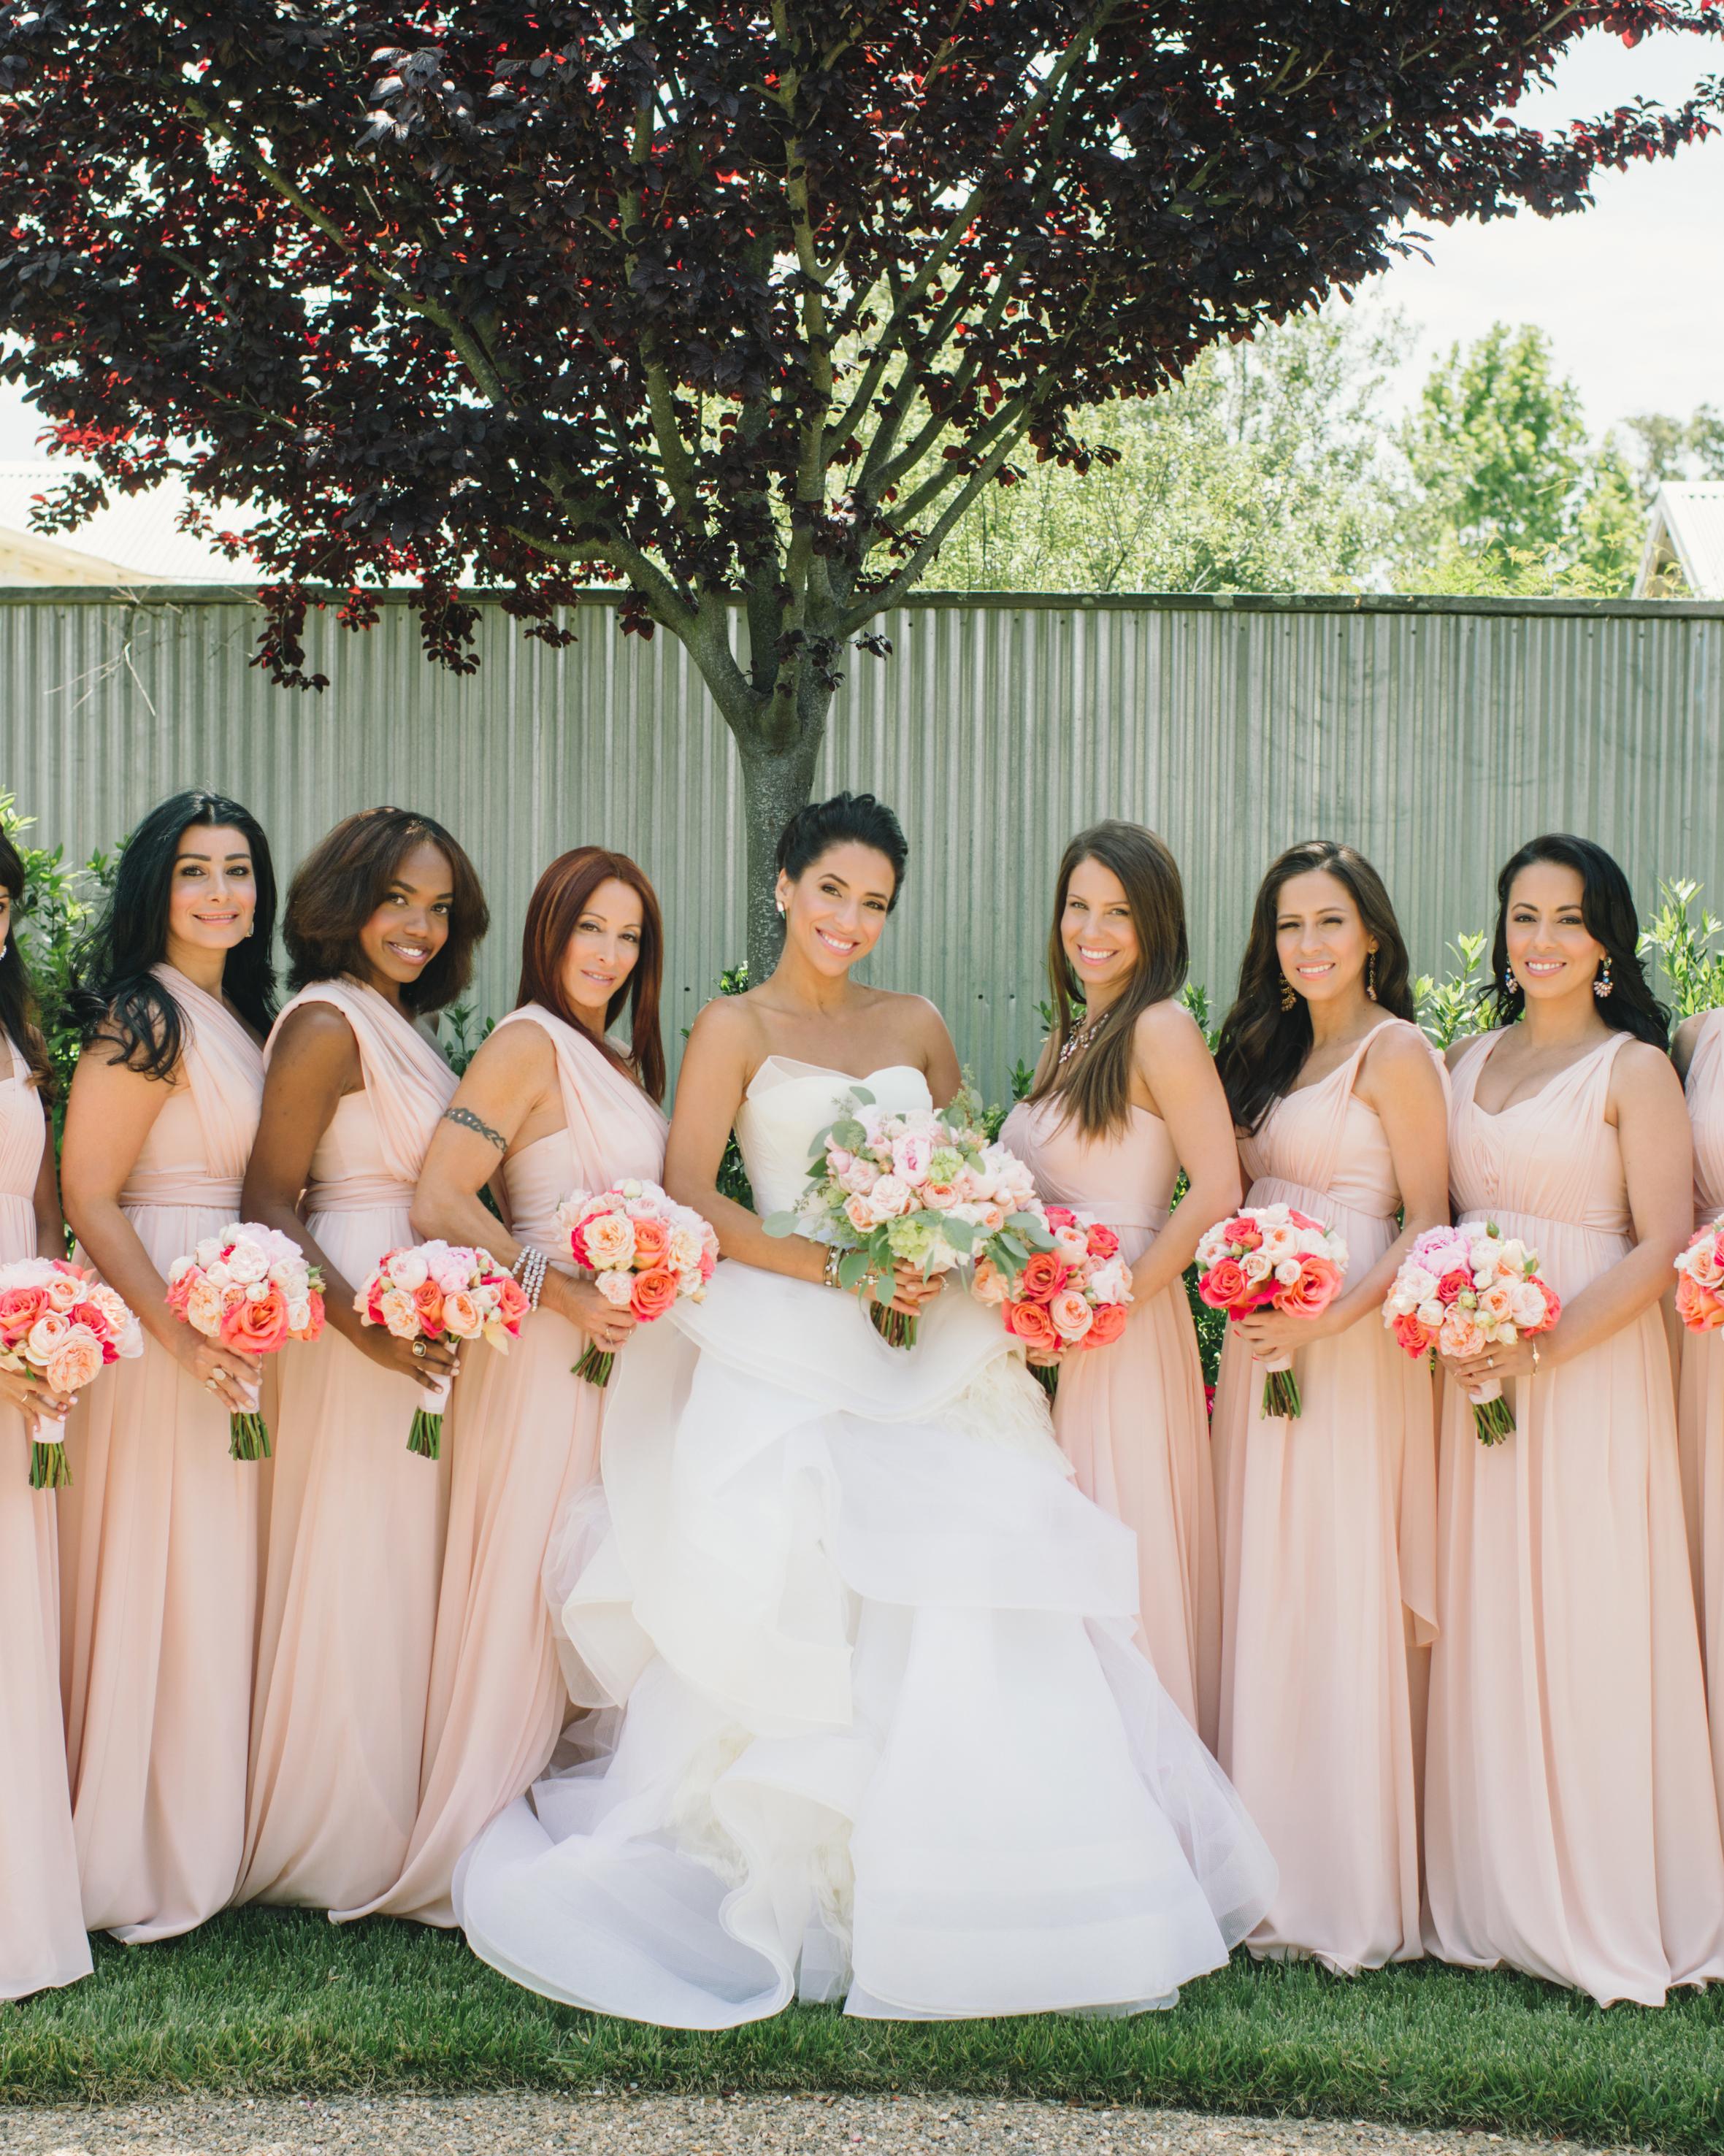 vanessa-joe-wedding-bridesmaids-7509-s111736-1214.jpg